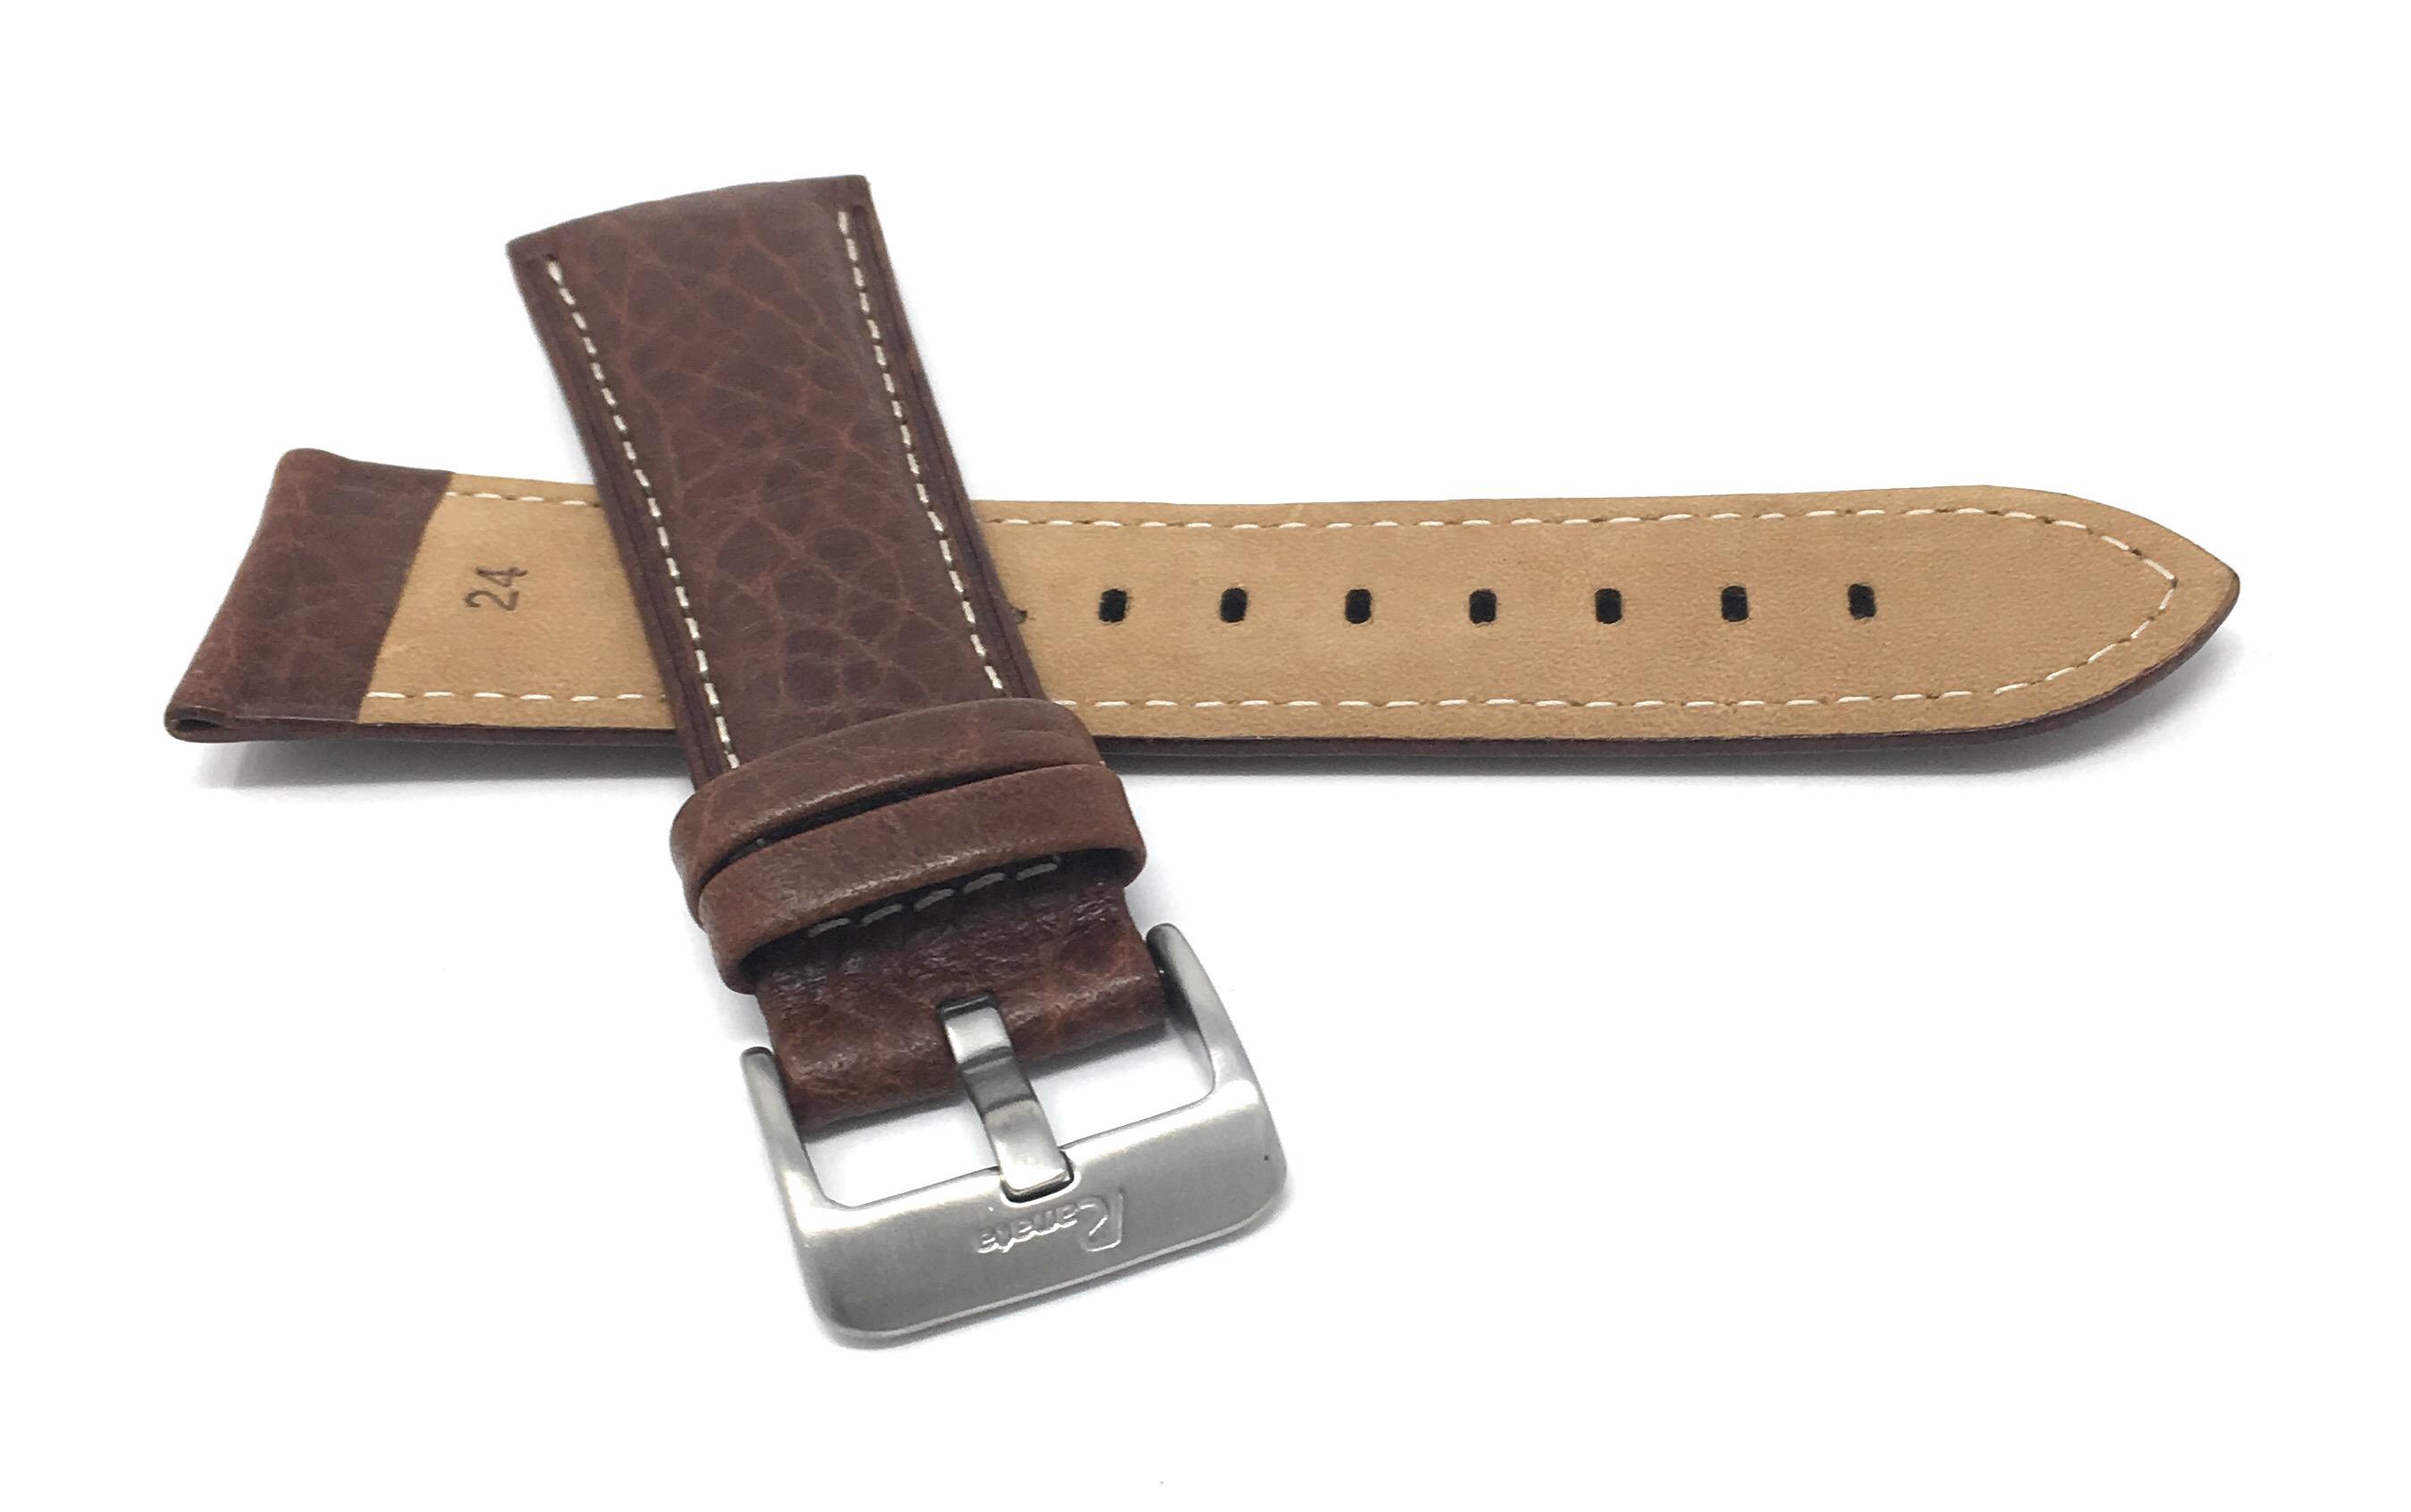 Bandini-Mens-Italian-Leather-Watch-Band-Strap-Padded-Stitch-18mm-19mm-20mm-24mm thumbnail 20